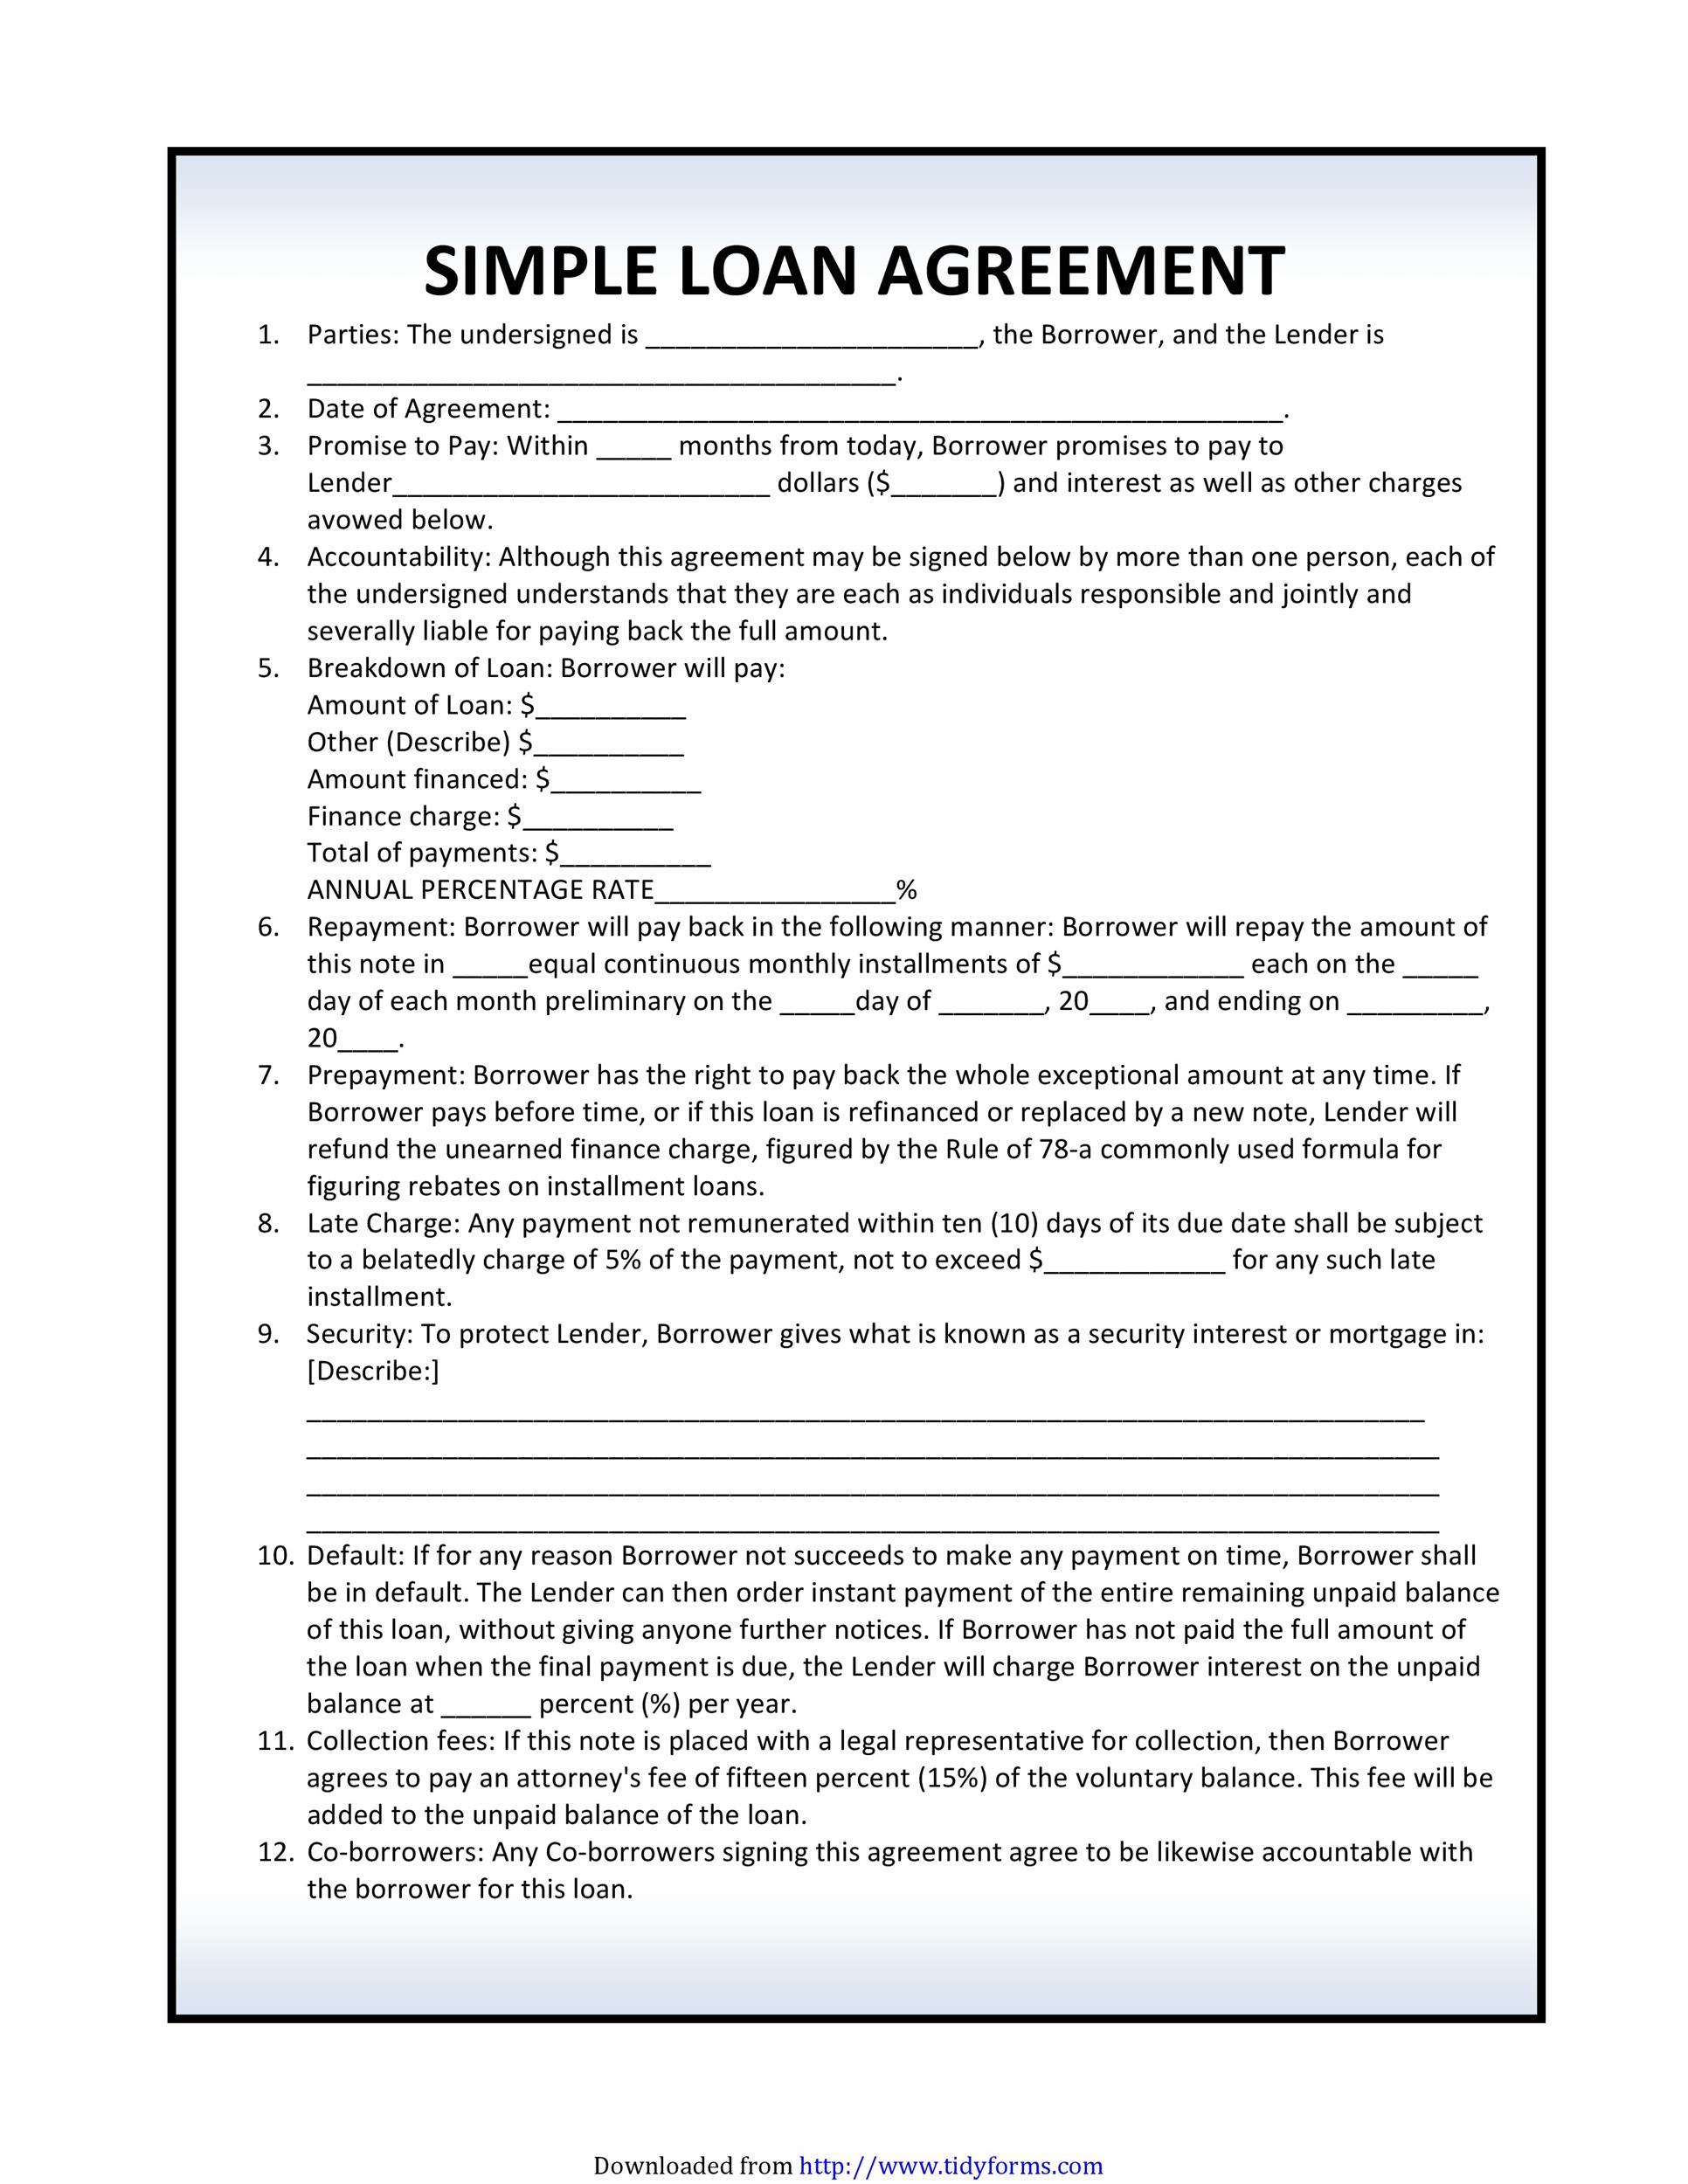 Sarah brown (borrower) tammy smith (lender) original loan date: 40 Free Loan Agreement Templates Word Pdf Á… Templatelab